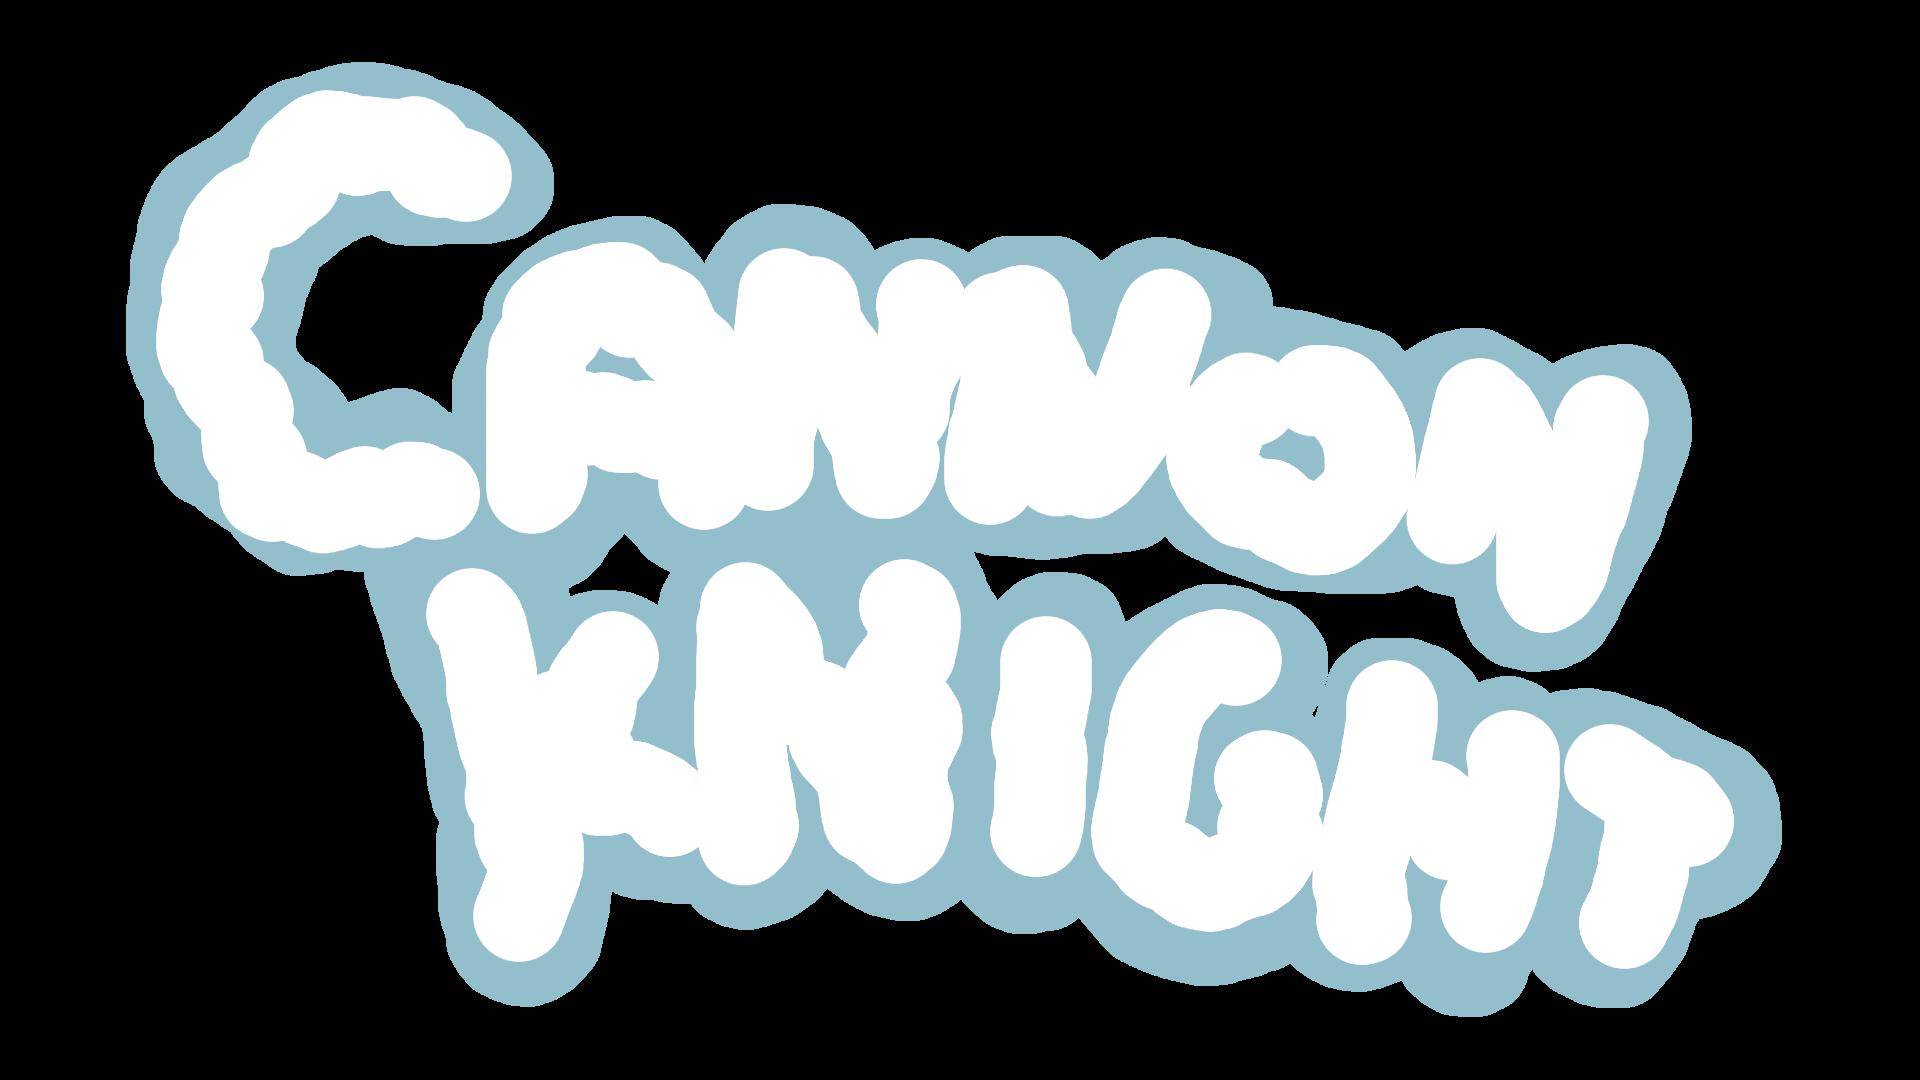 Cannon Knight